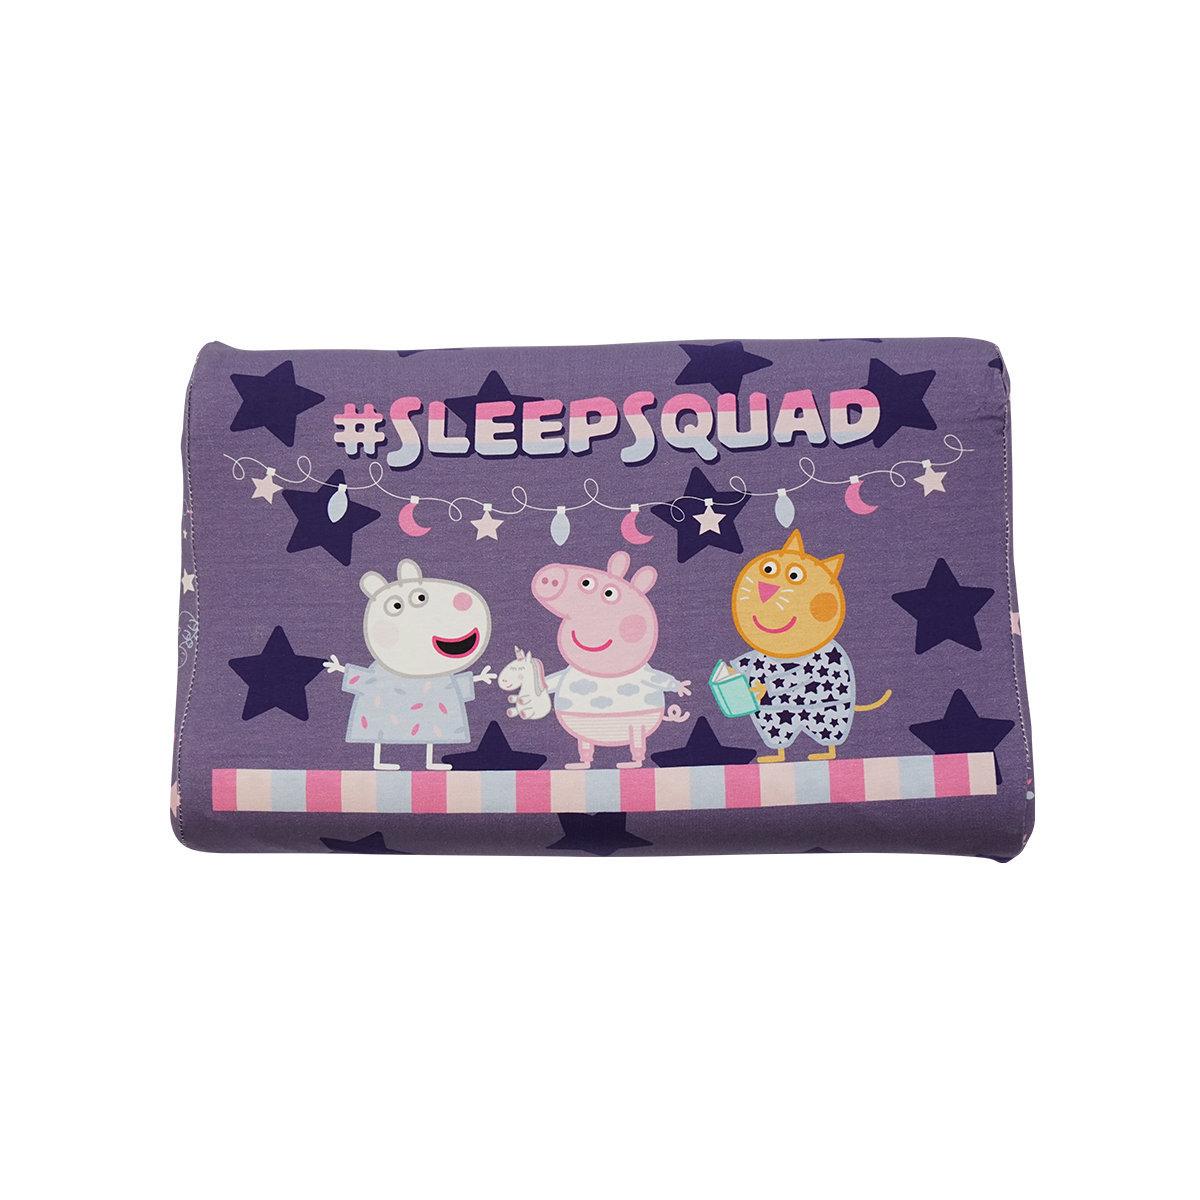 Peppa Pig Latex Pillow U.7 (Age 1-4)(Light Purple)